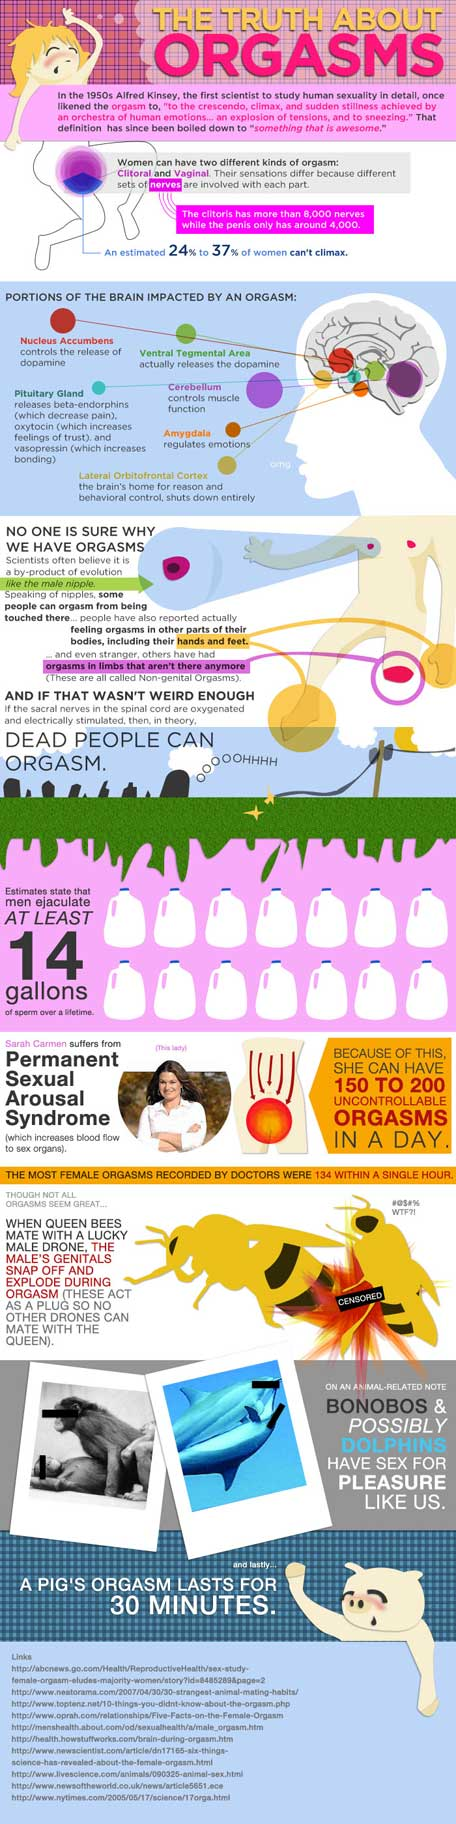 Orgasm stats